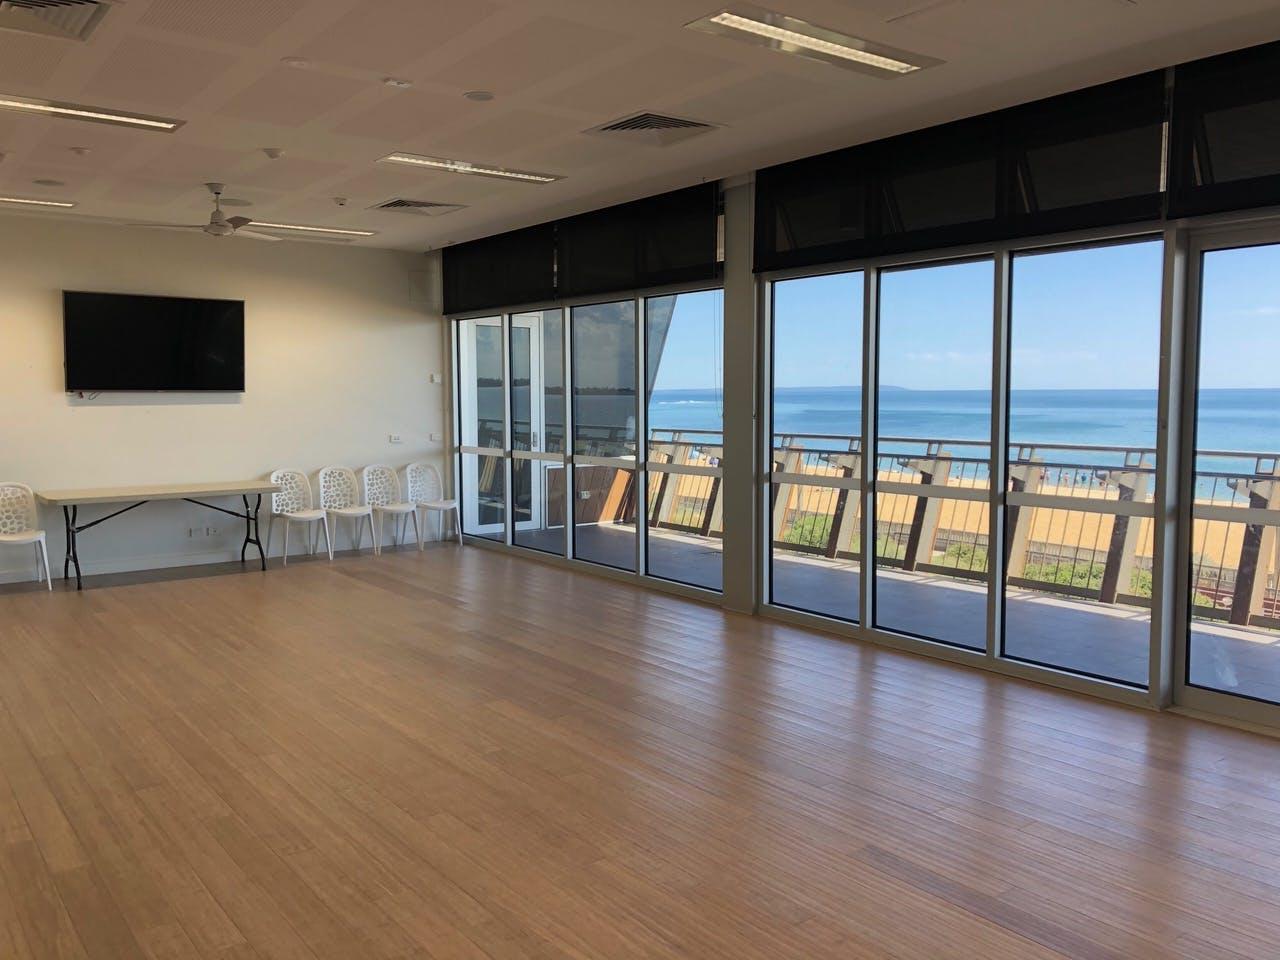 The Long Room, multi-use area at Mordialloc Life Saving Club, image 1